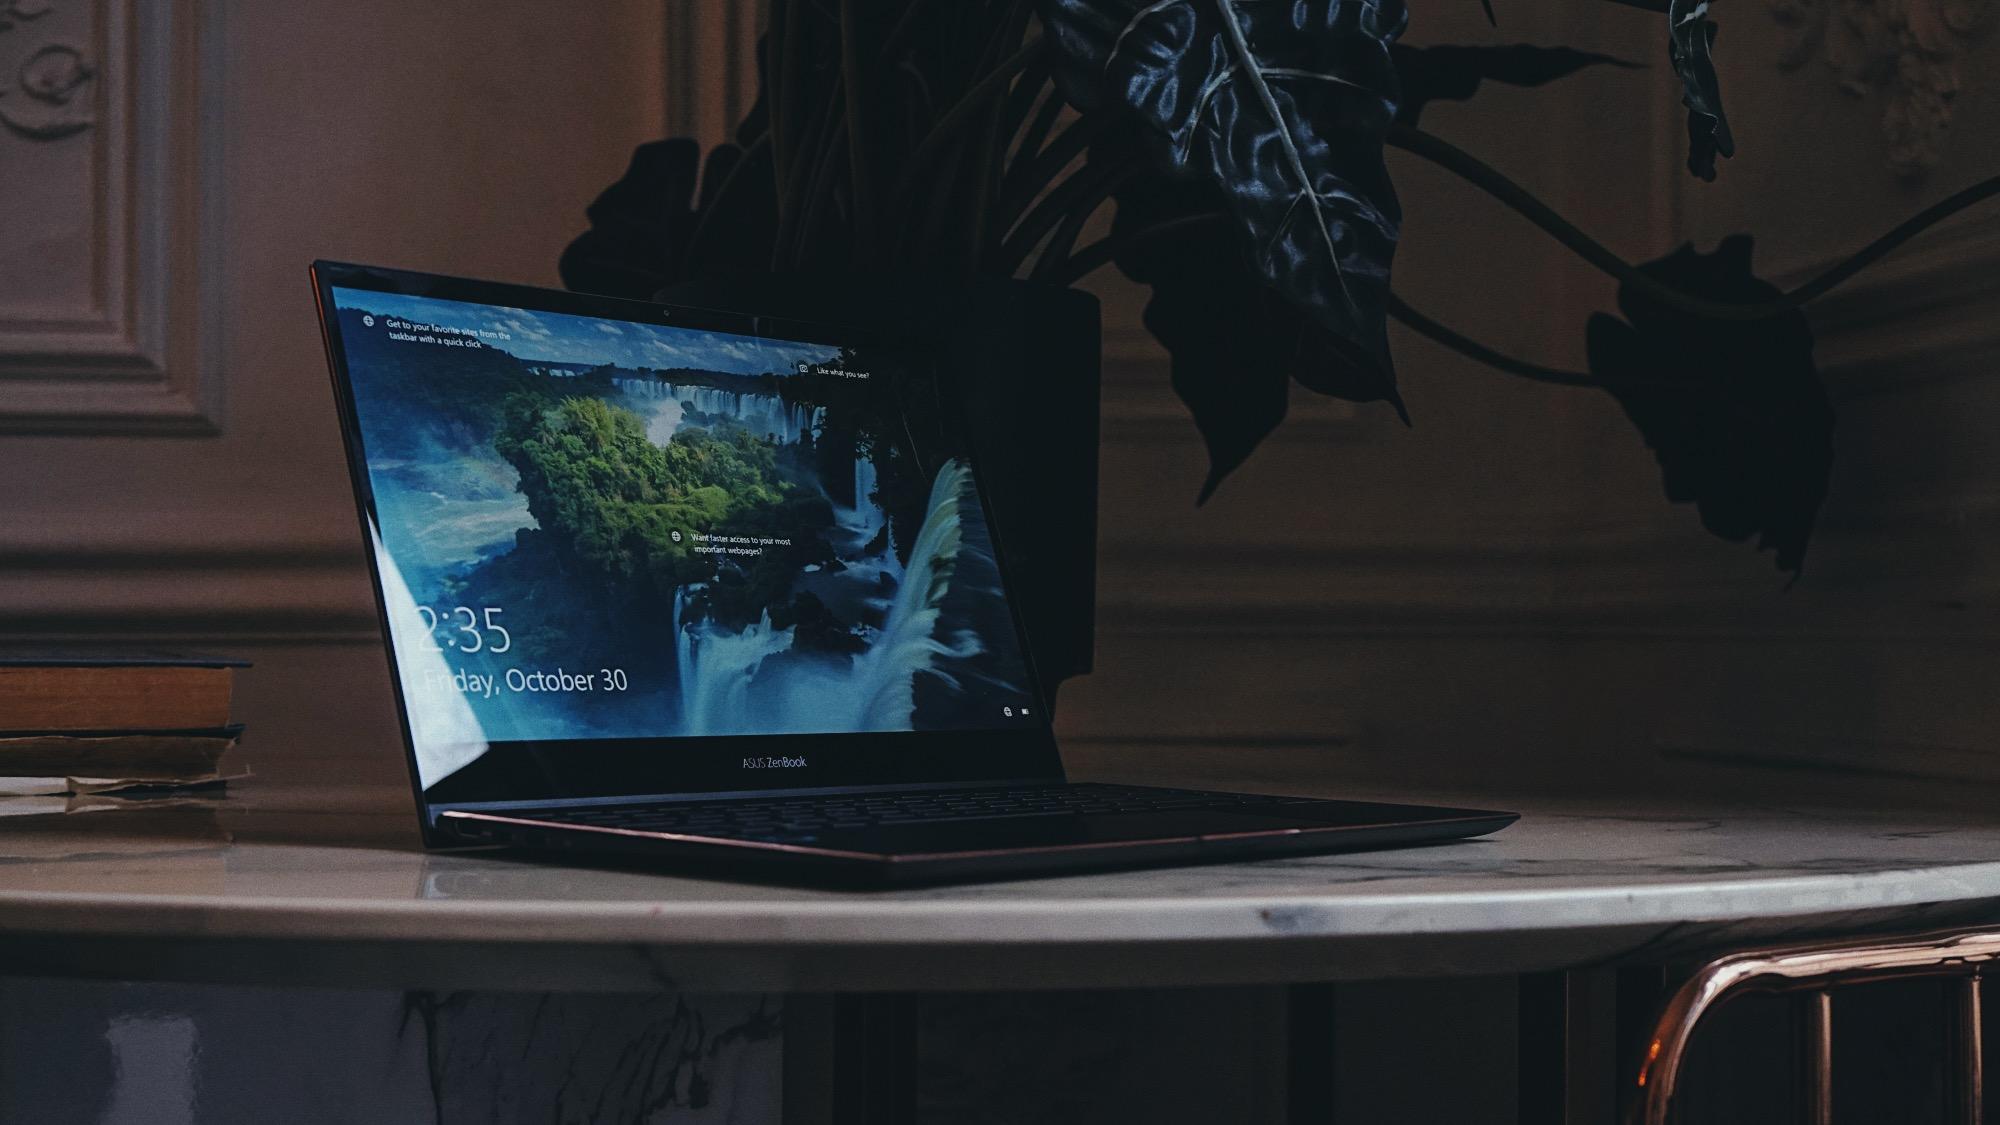 Обзор ASUS ZenBook Flip S UX371: дизайн, трансформация, OLED и Tiger Lake